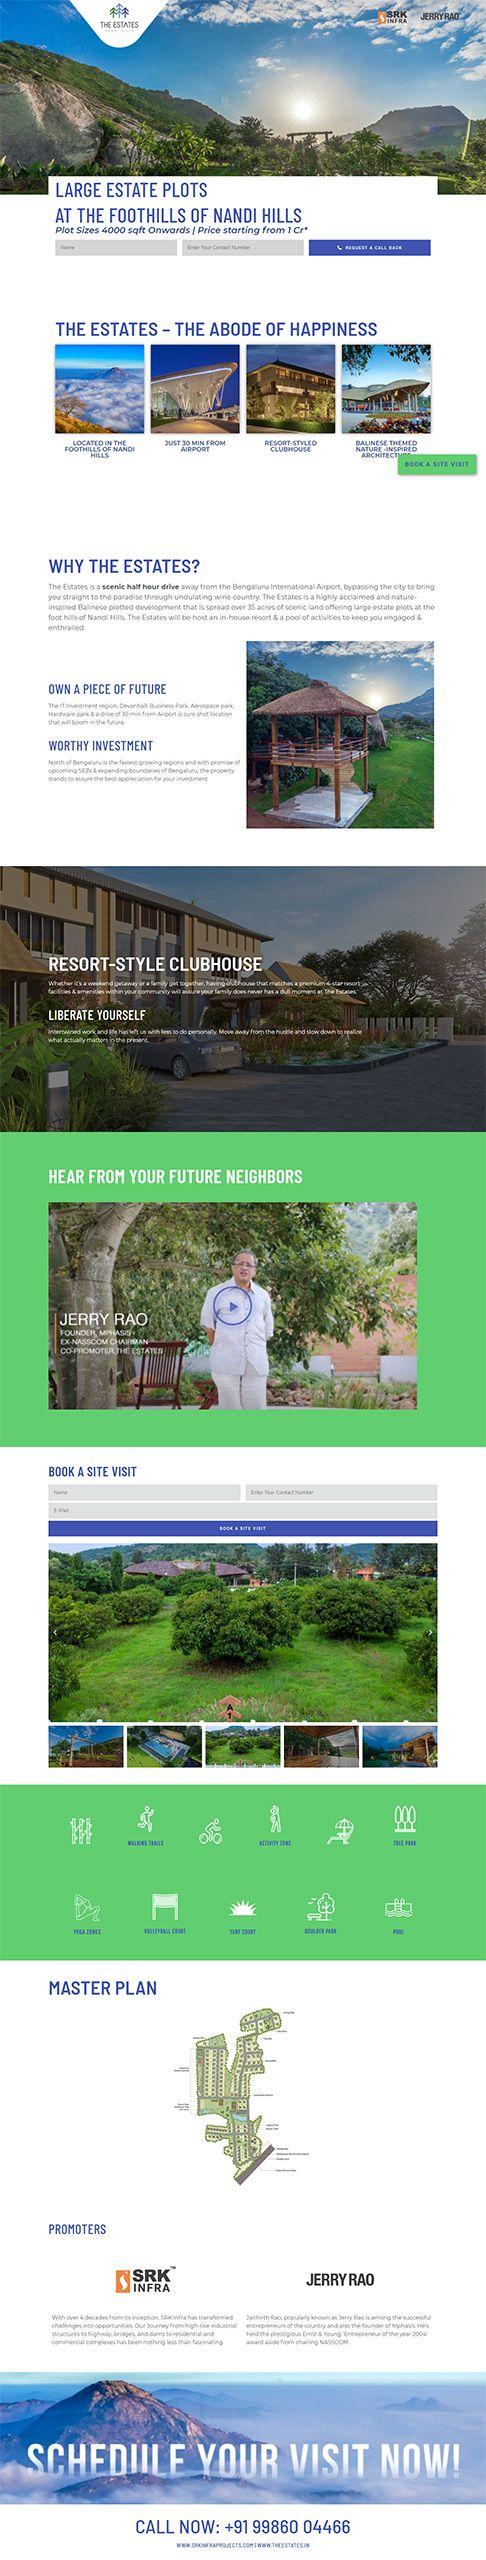 Website Design Real Estate Brand Bangalore